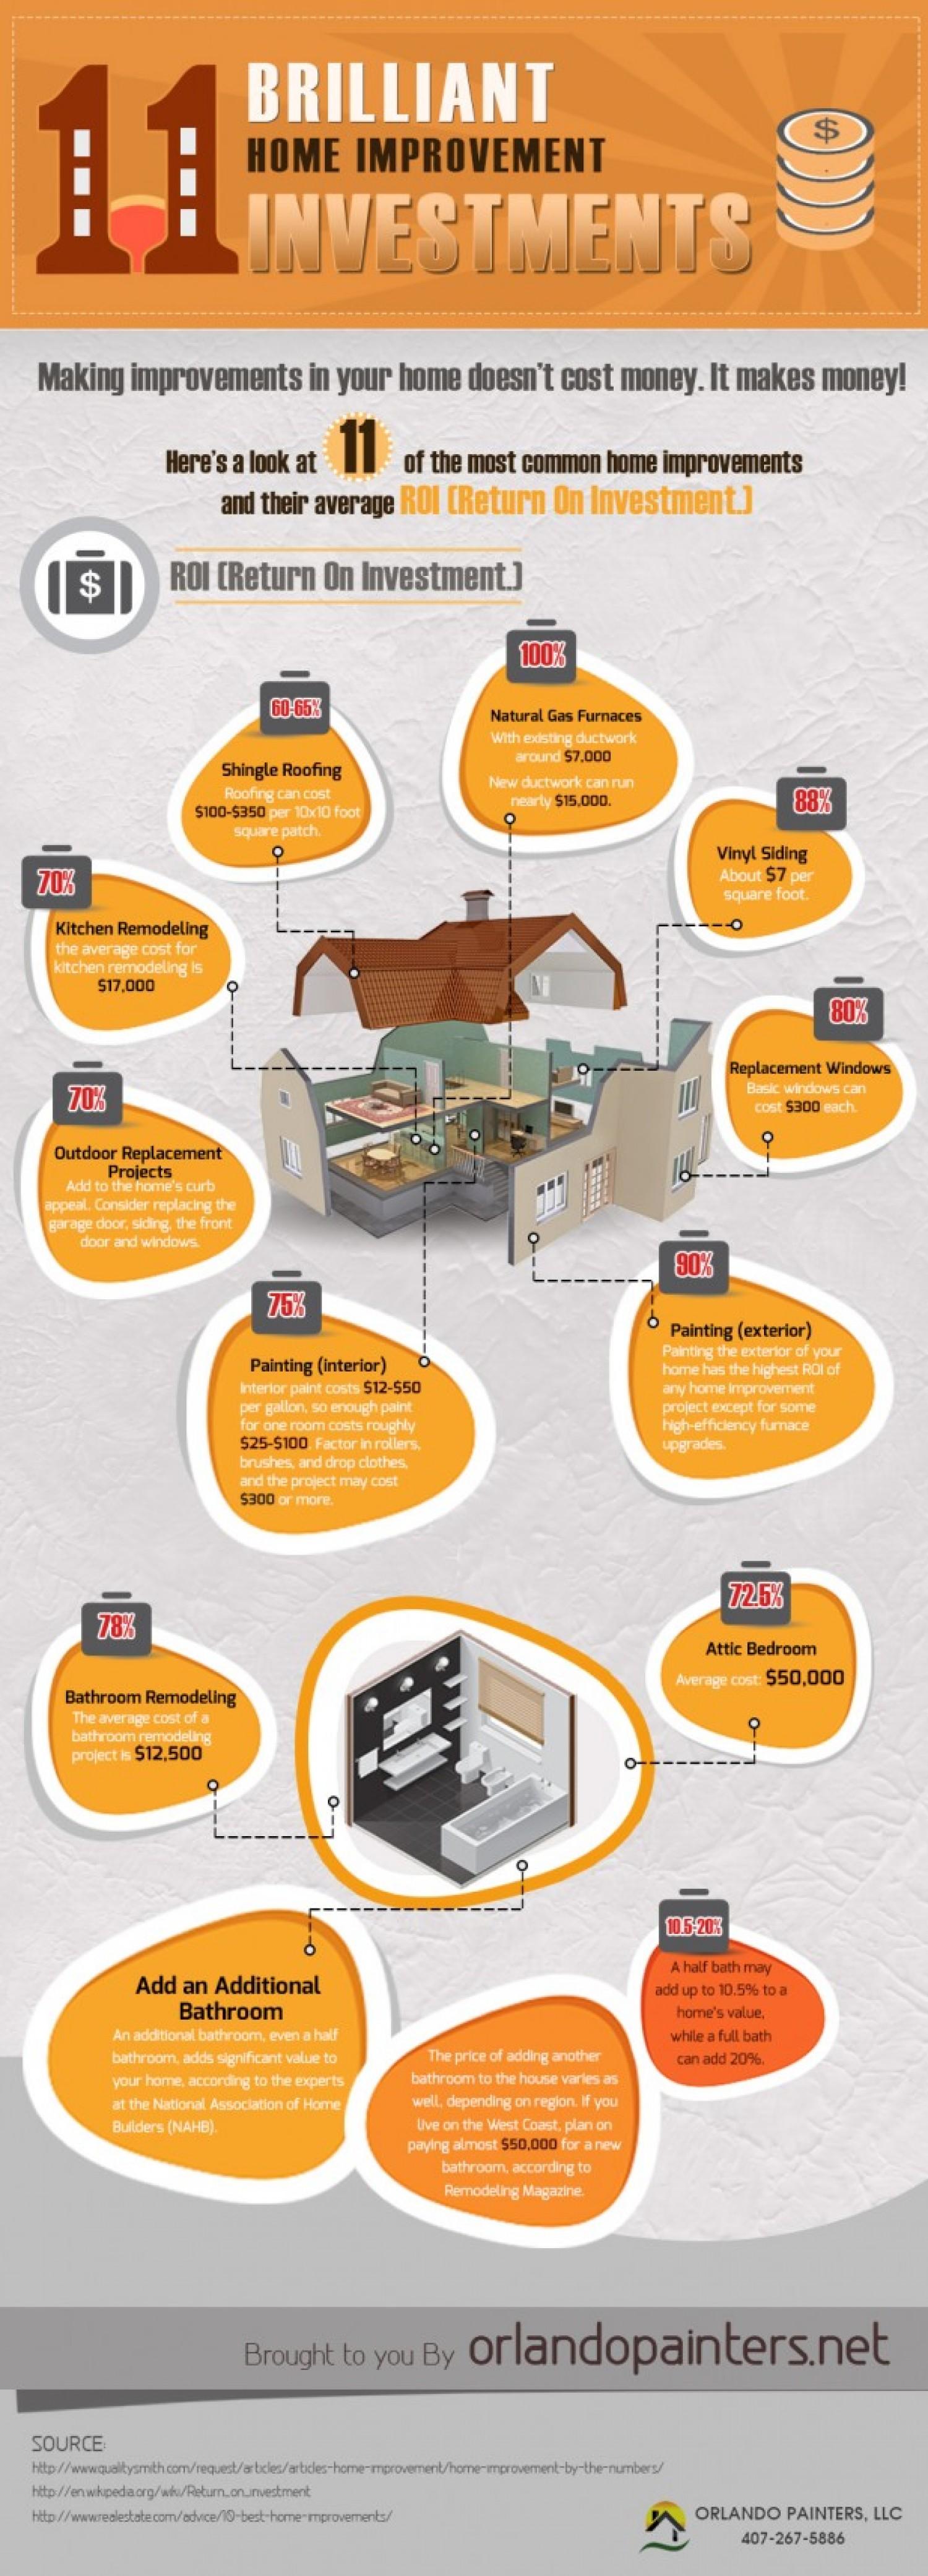 20. 11 Brilliant Home Improvement Investments